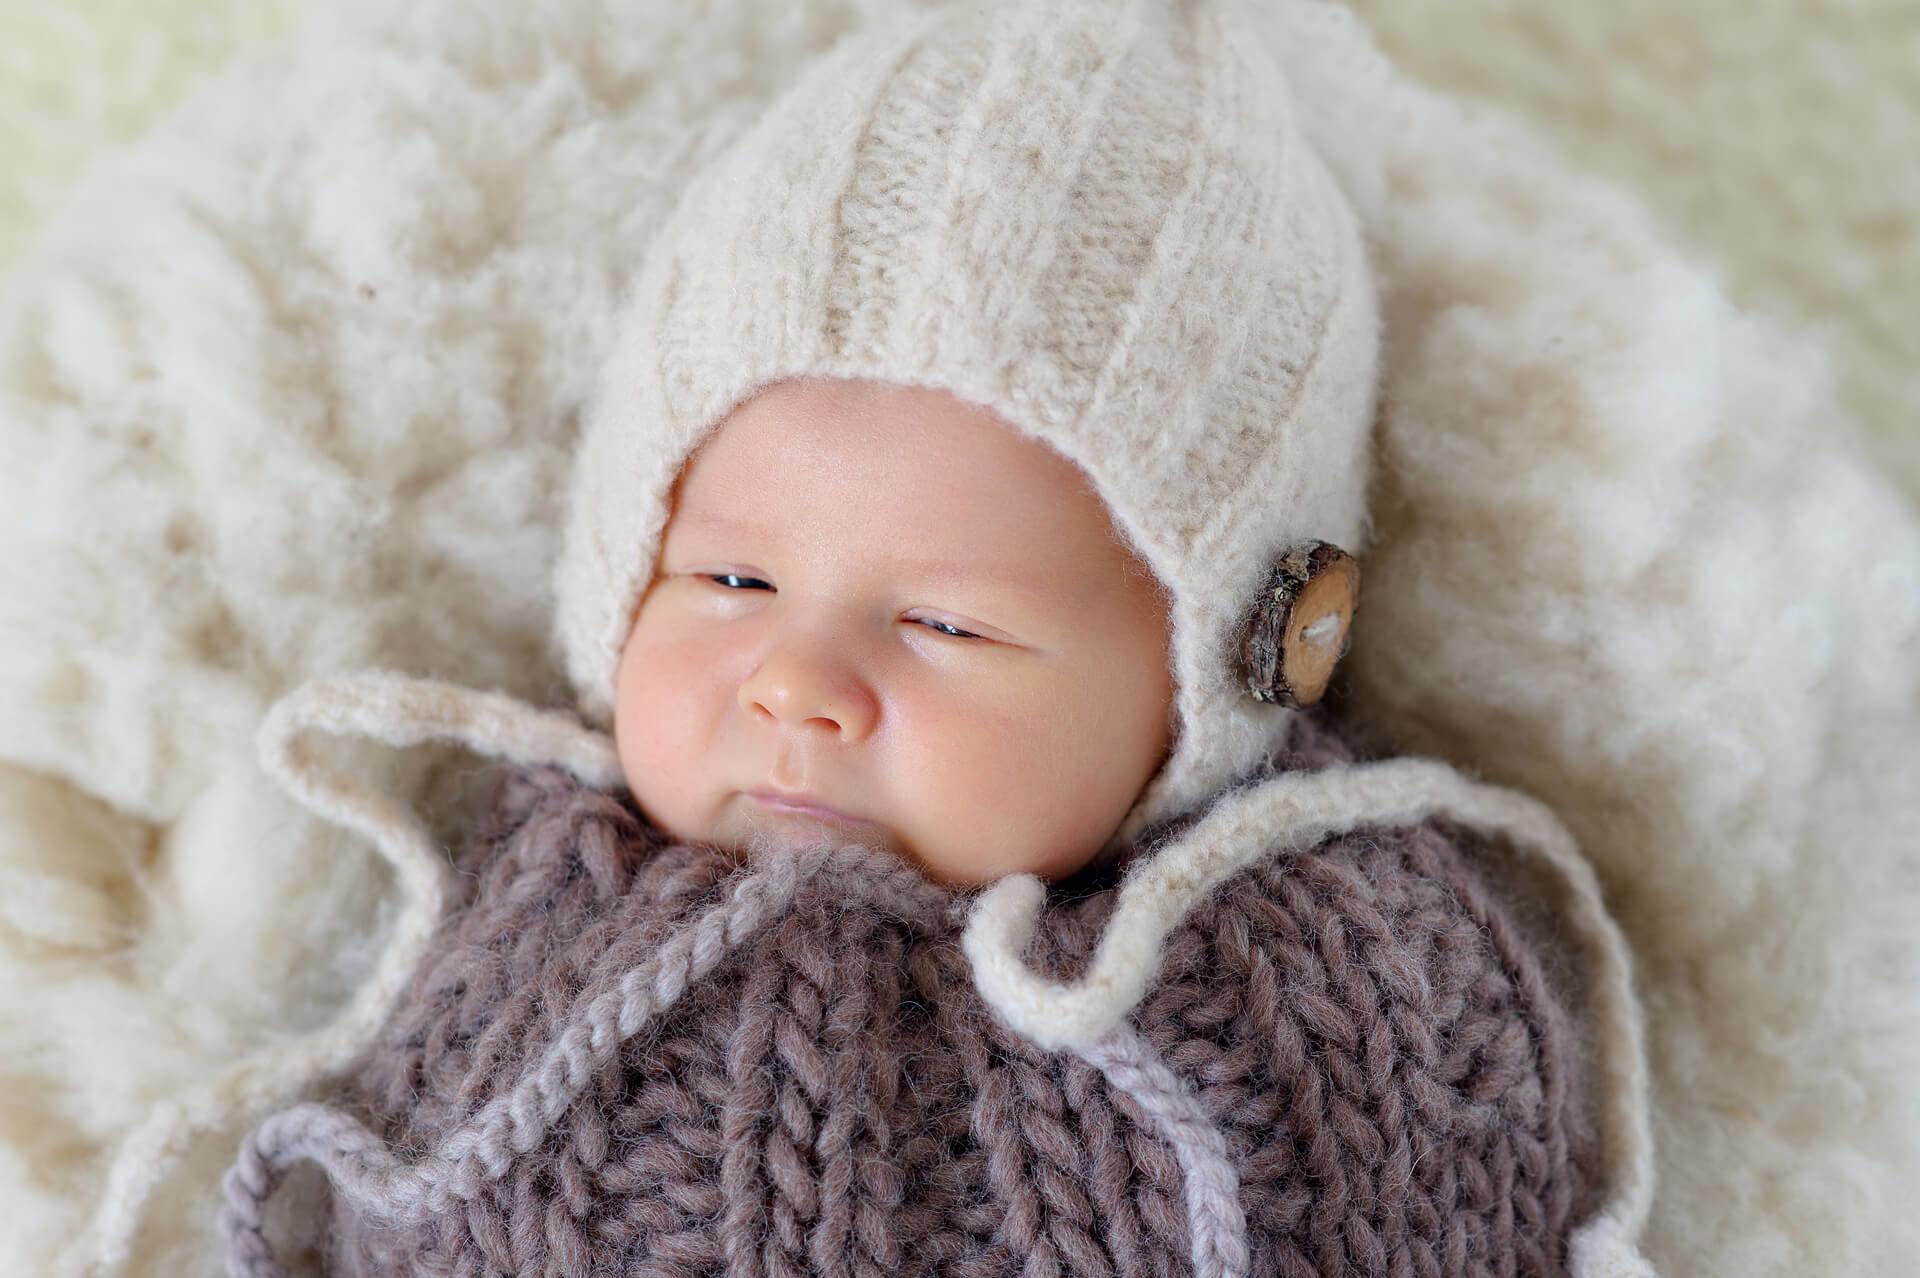 novorodenec-newborn-atelier-interier-umelecke-profesionalne-fotenie-fotograf-peter-norulak-kosice_06